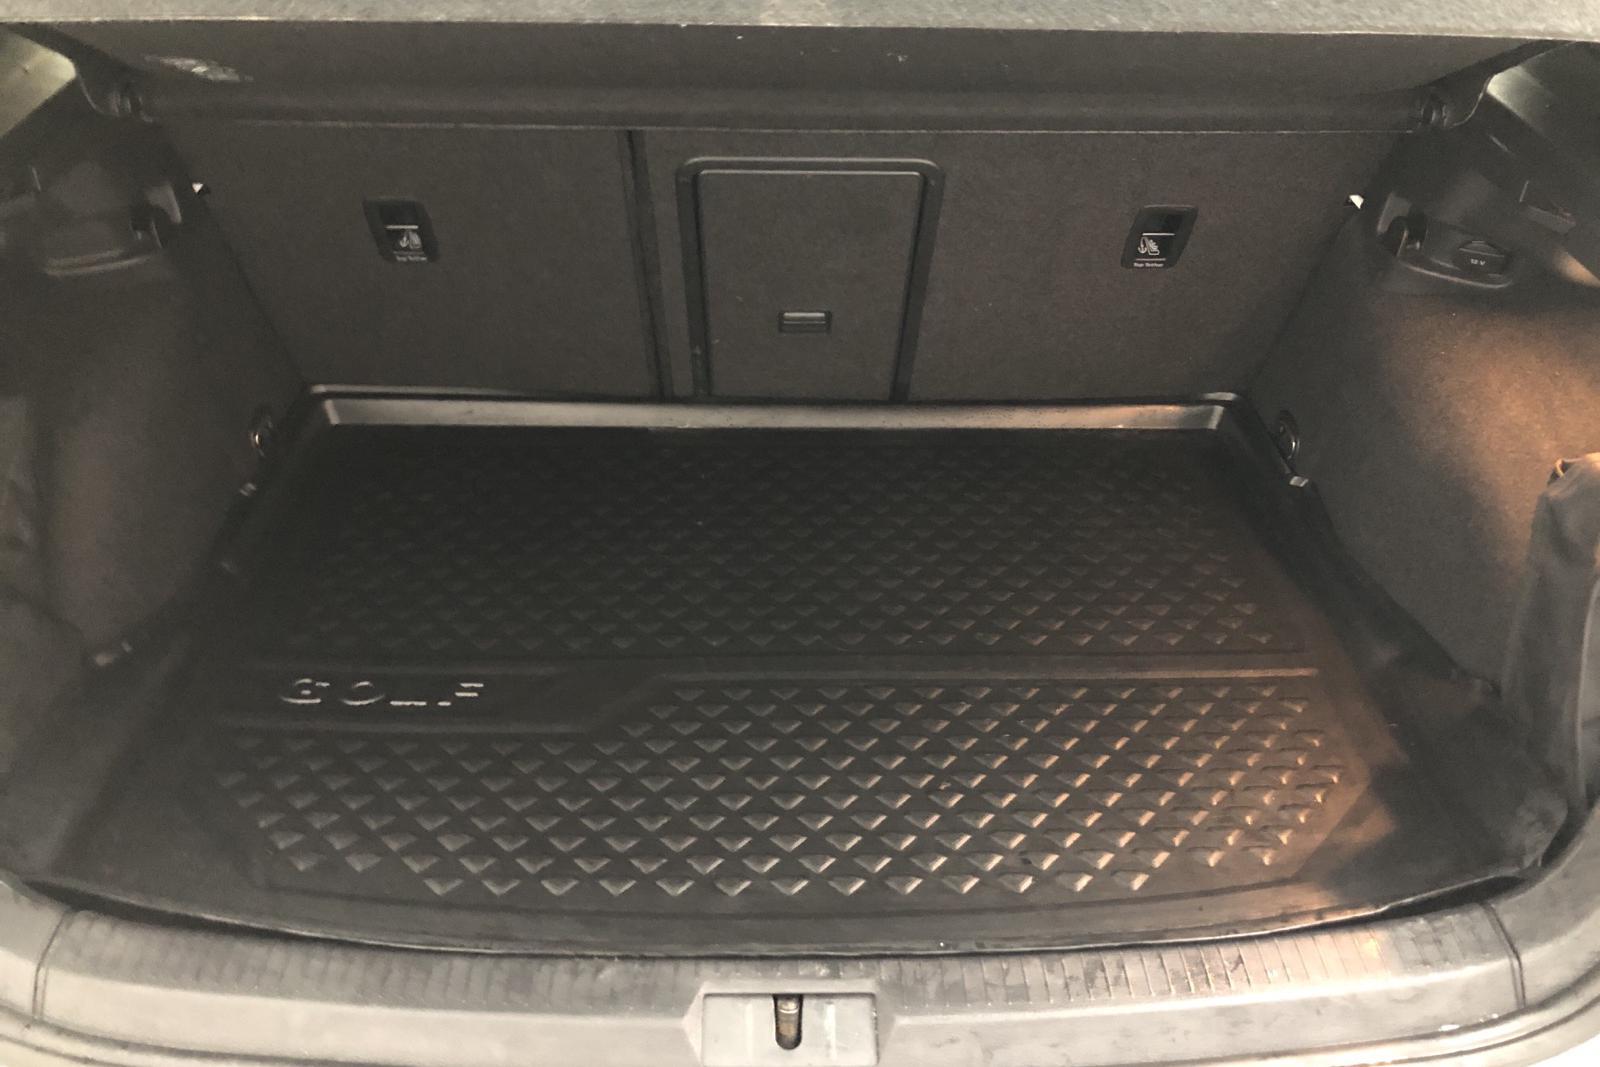 VW Golf VII 1.4 GTE Plug-in-Hybrid 5dr (204hk) - 14 000 mil - Automat - vit - 2016